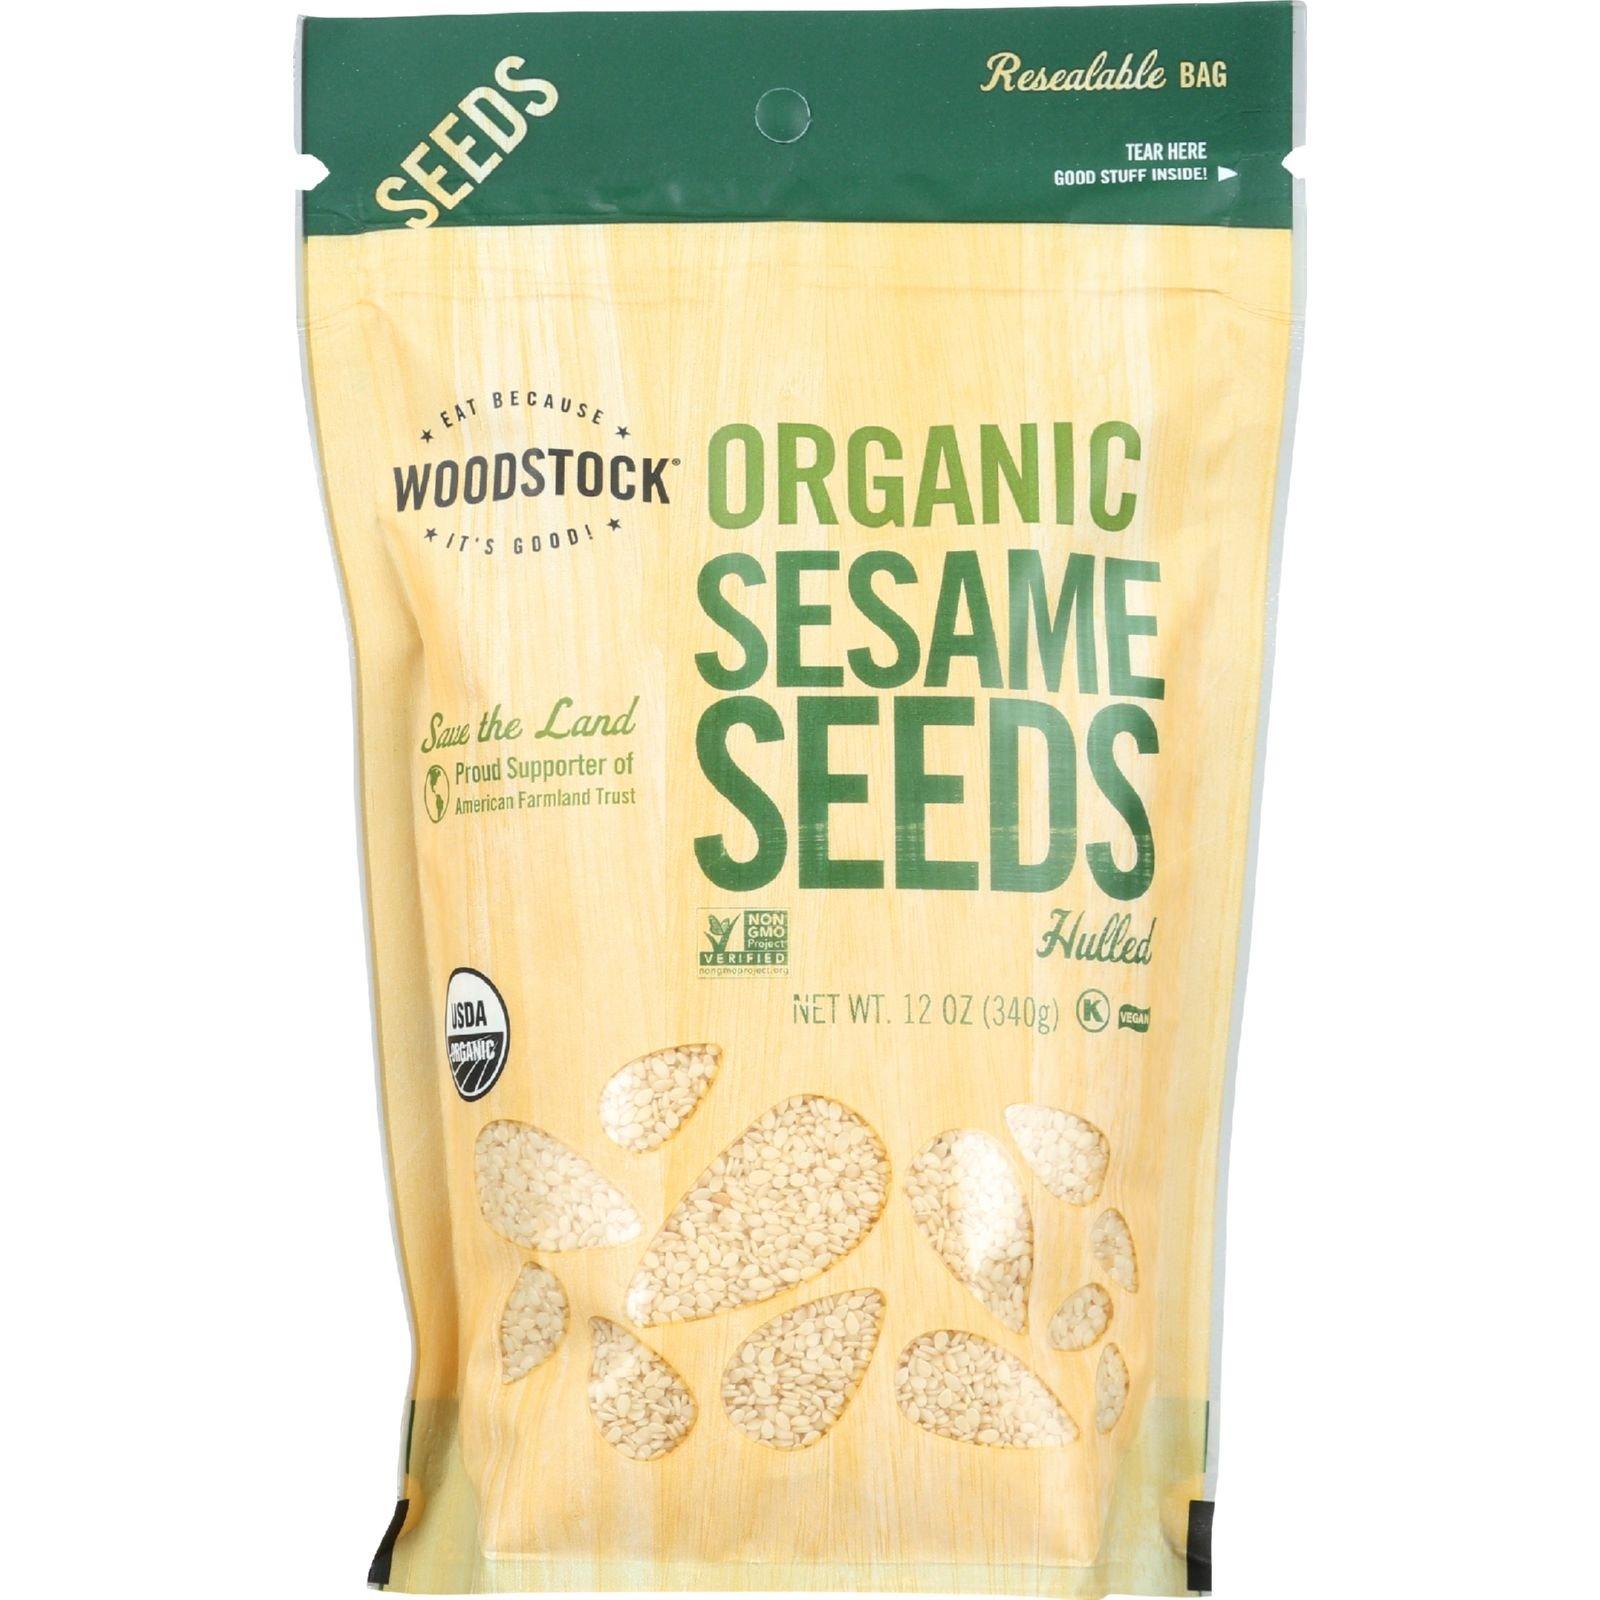 Woodstock Seeds - Organic - Sesame - Hulled - Raw - 12 oz - case of 8